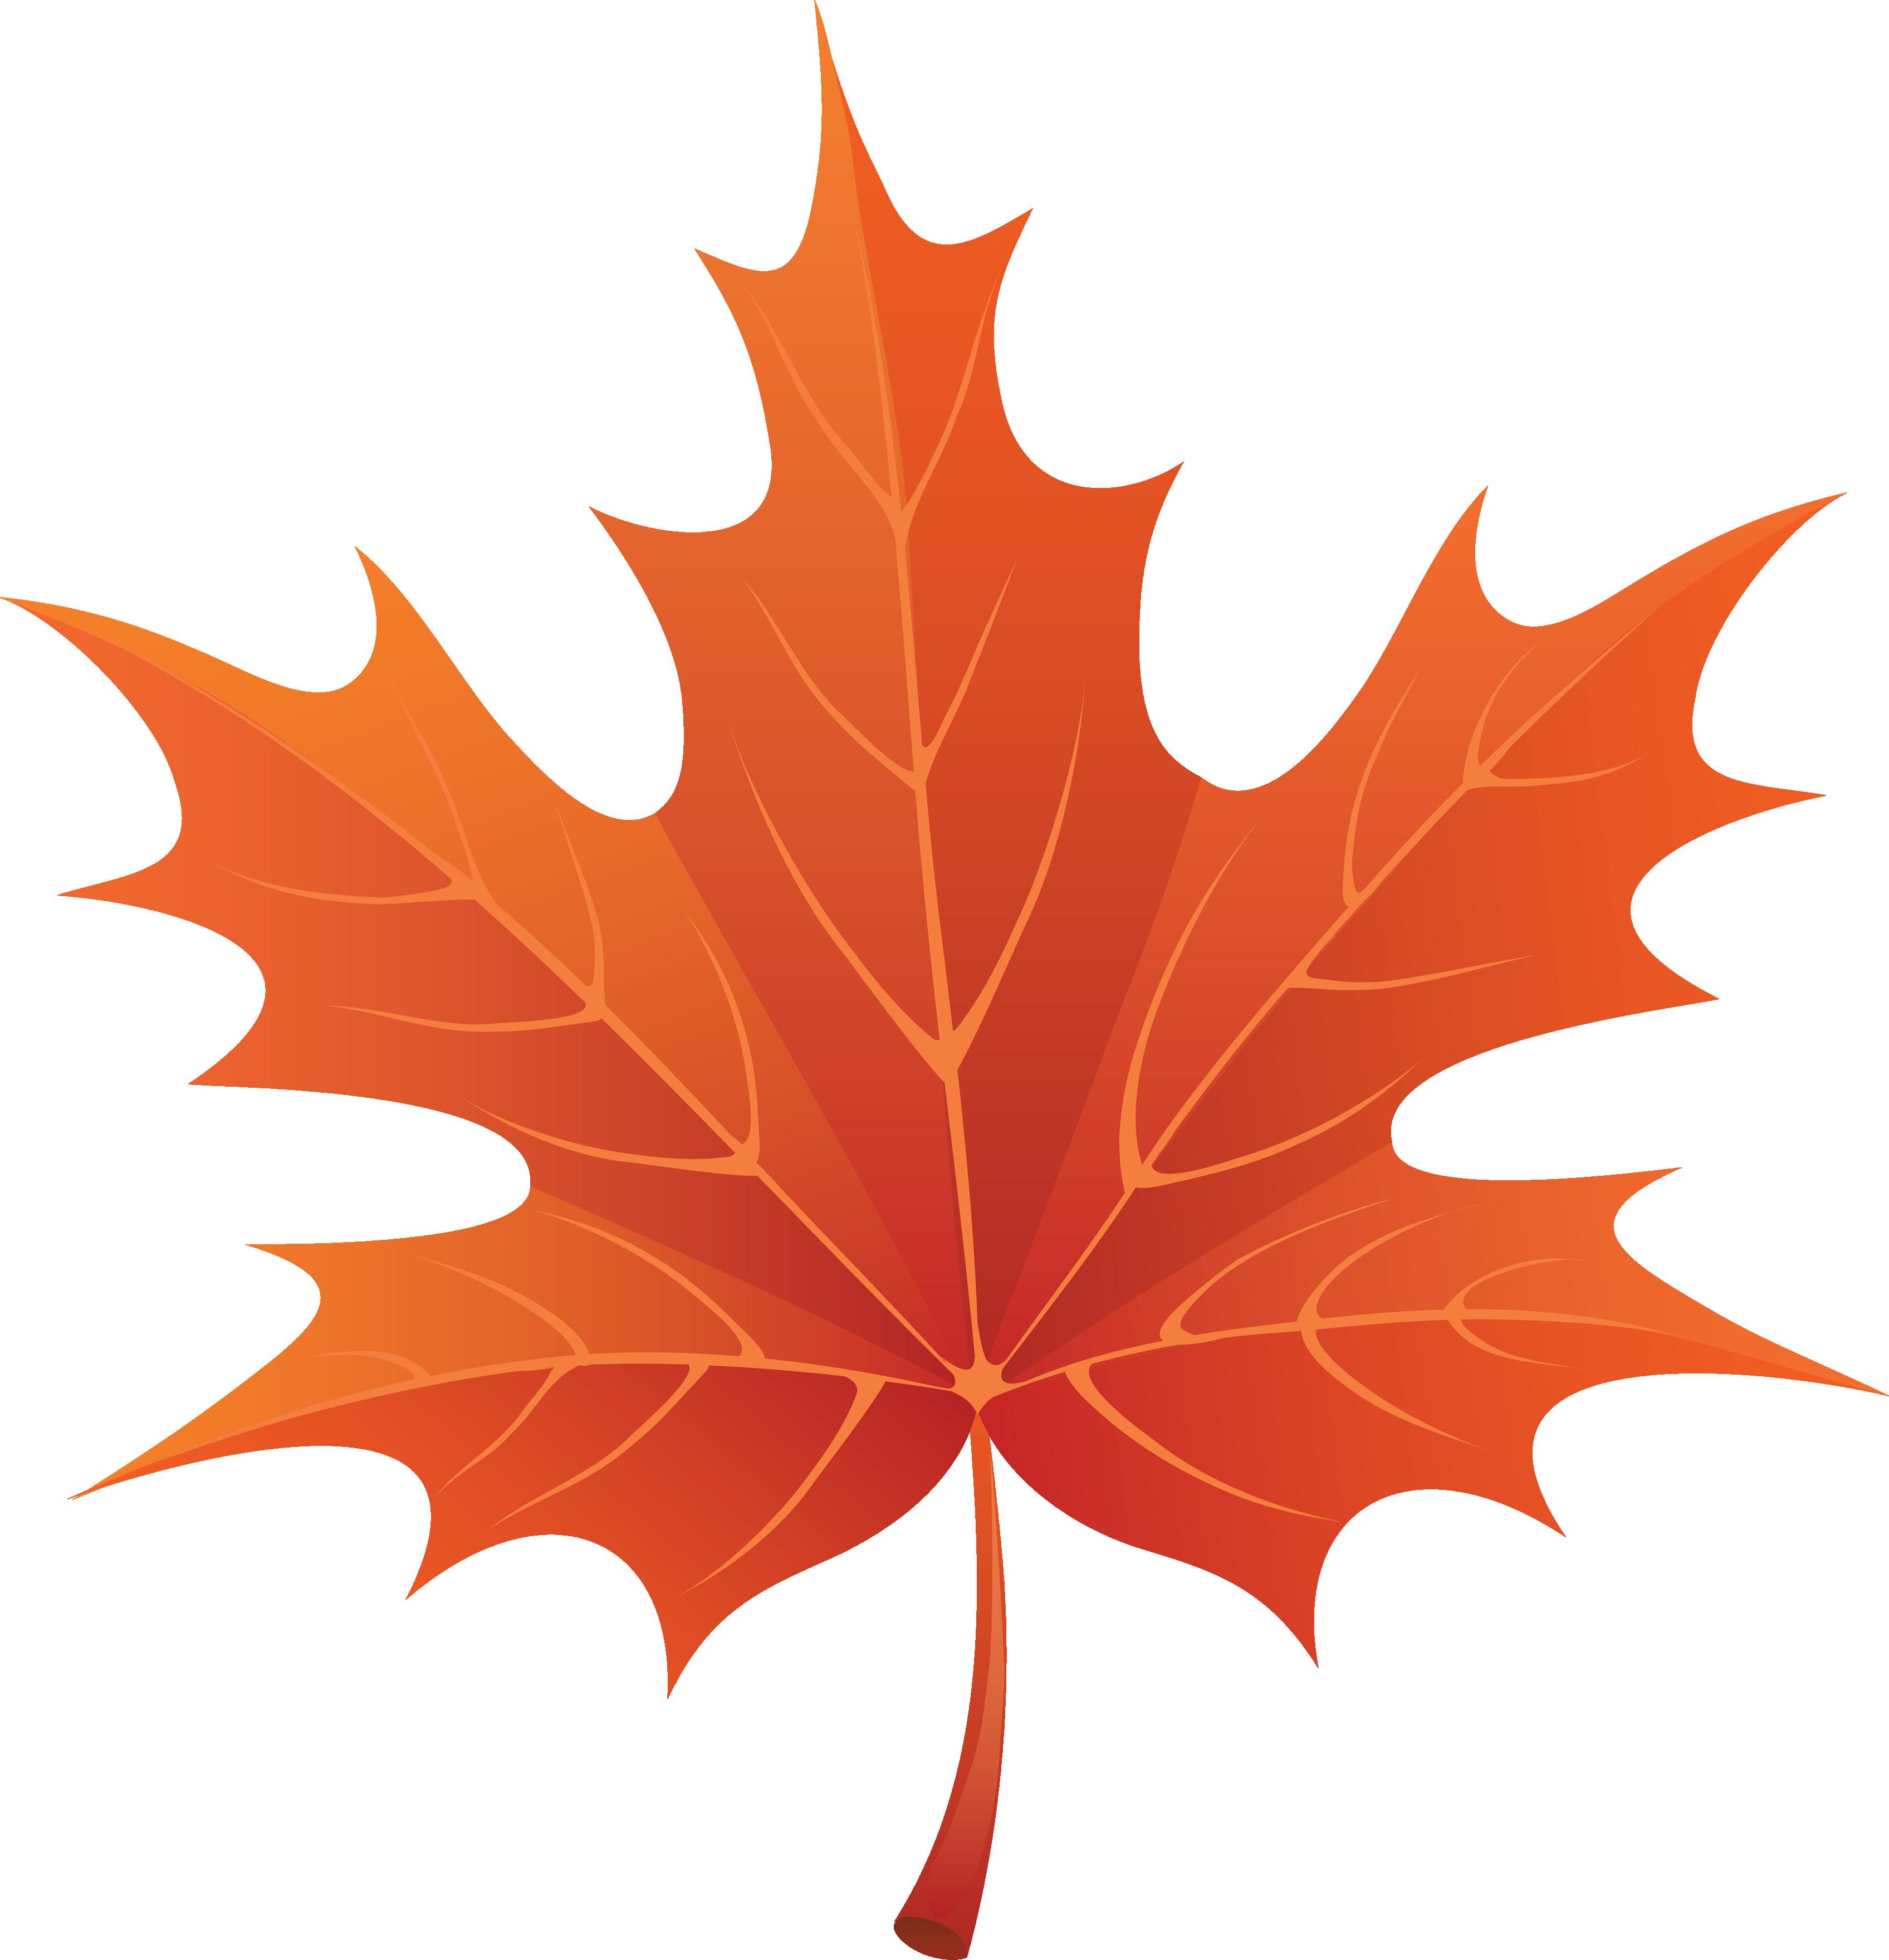 Fall Leaves Pumpkin Leaf Png Free Png Images 2